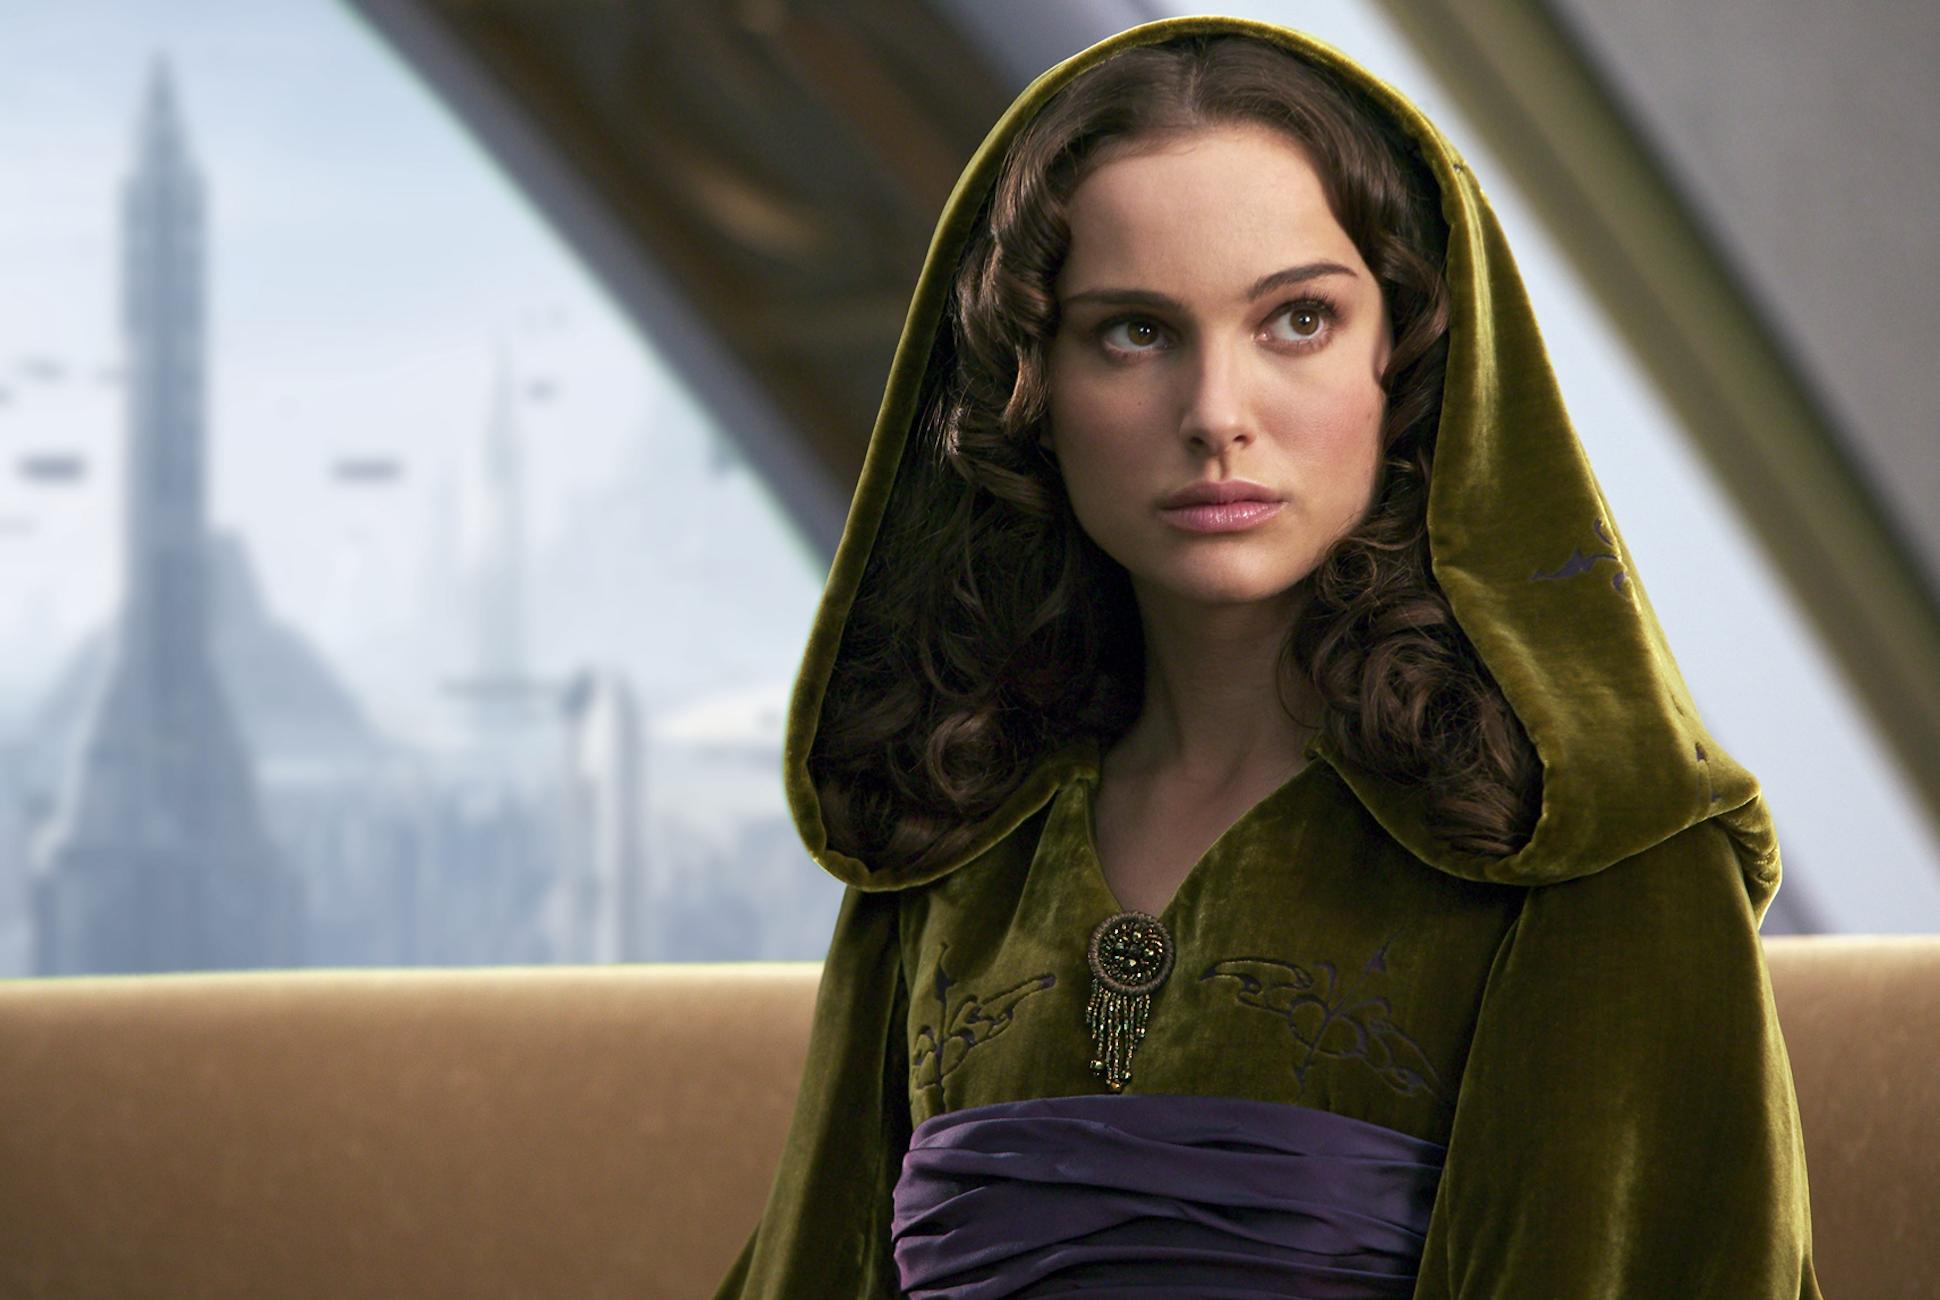 Natalie Portman opens up about Star Wars prequel backlash